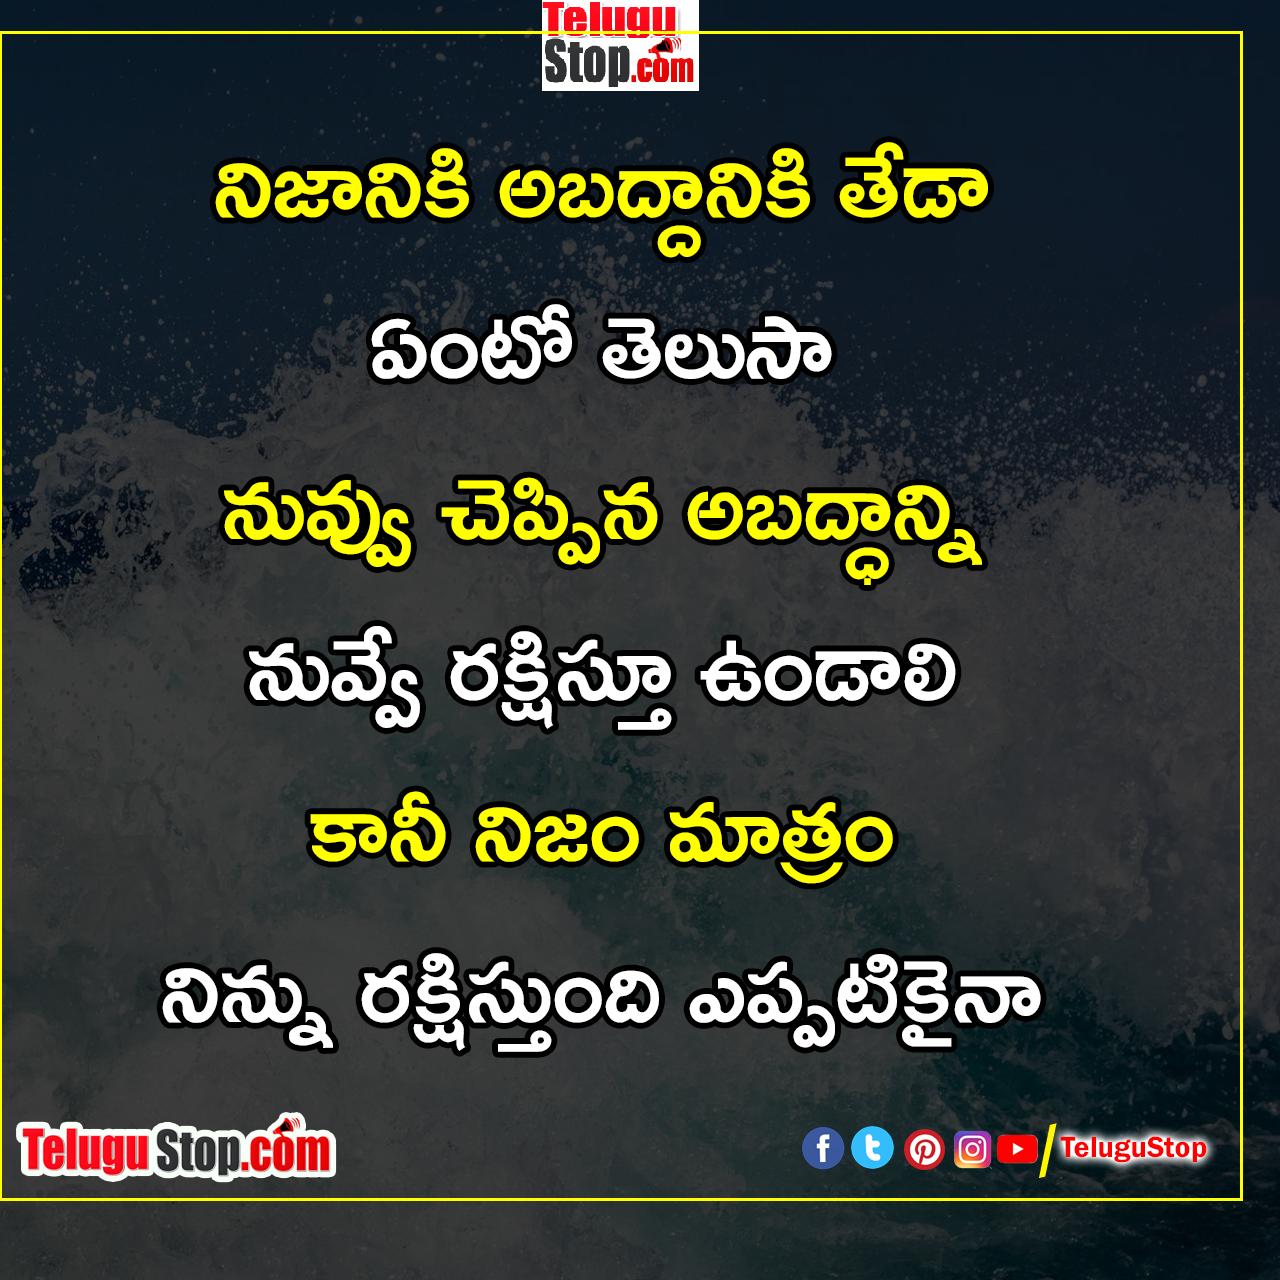 Telugu Attitude Quotes In Telugu, Leave Happy Quotes In Telugu, People Are Needed Quotes In Telugu, Trust Saves You Quotes In Telugu-Telugu Daily Quotes - Inspirational/Motivational/Love/Friendship/Good Morning Quote